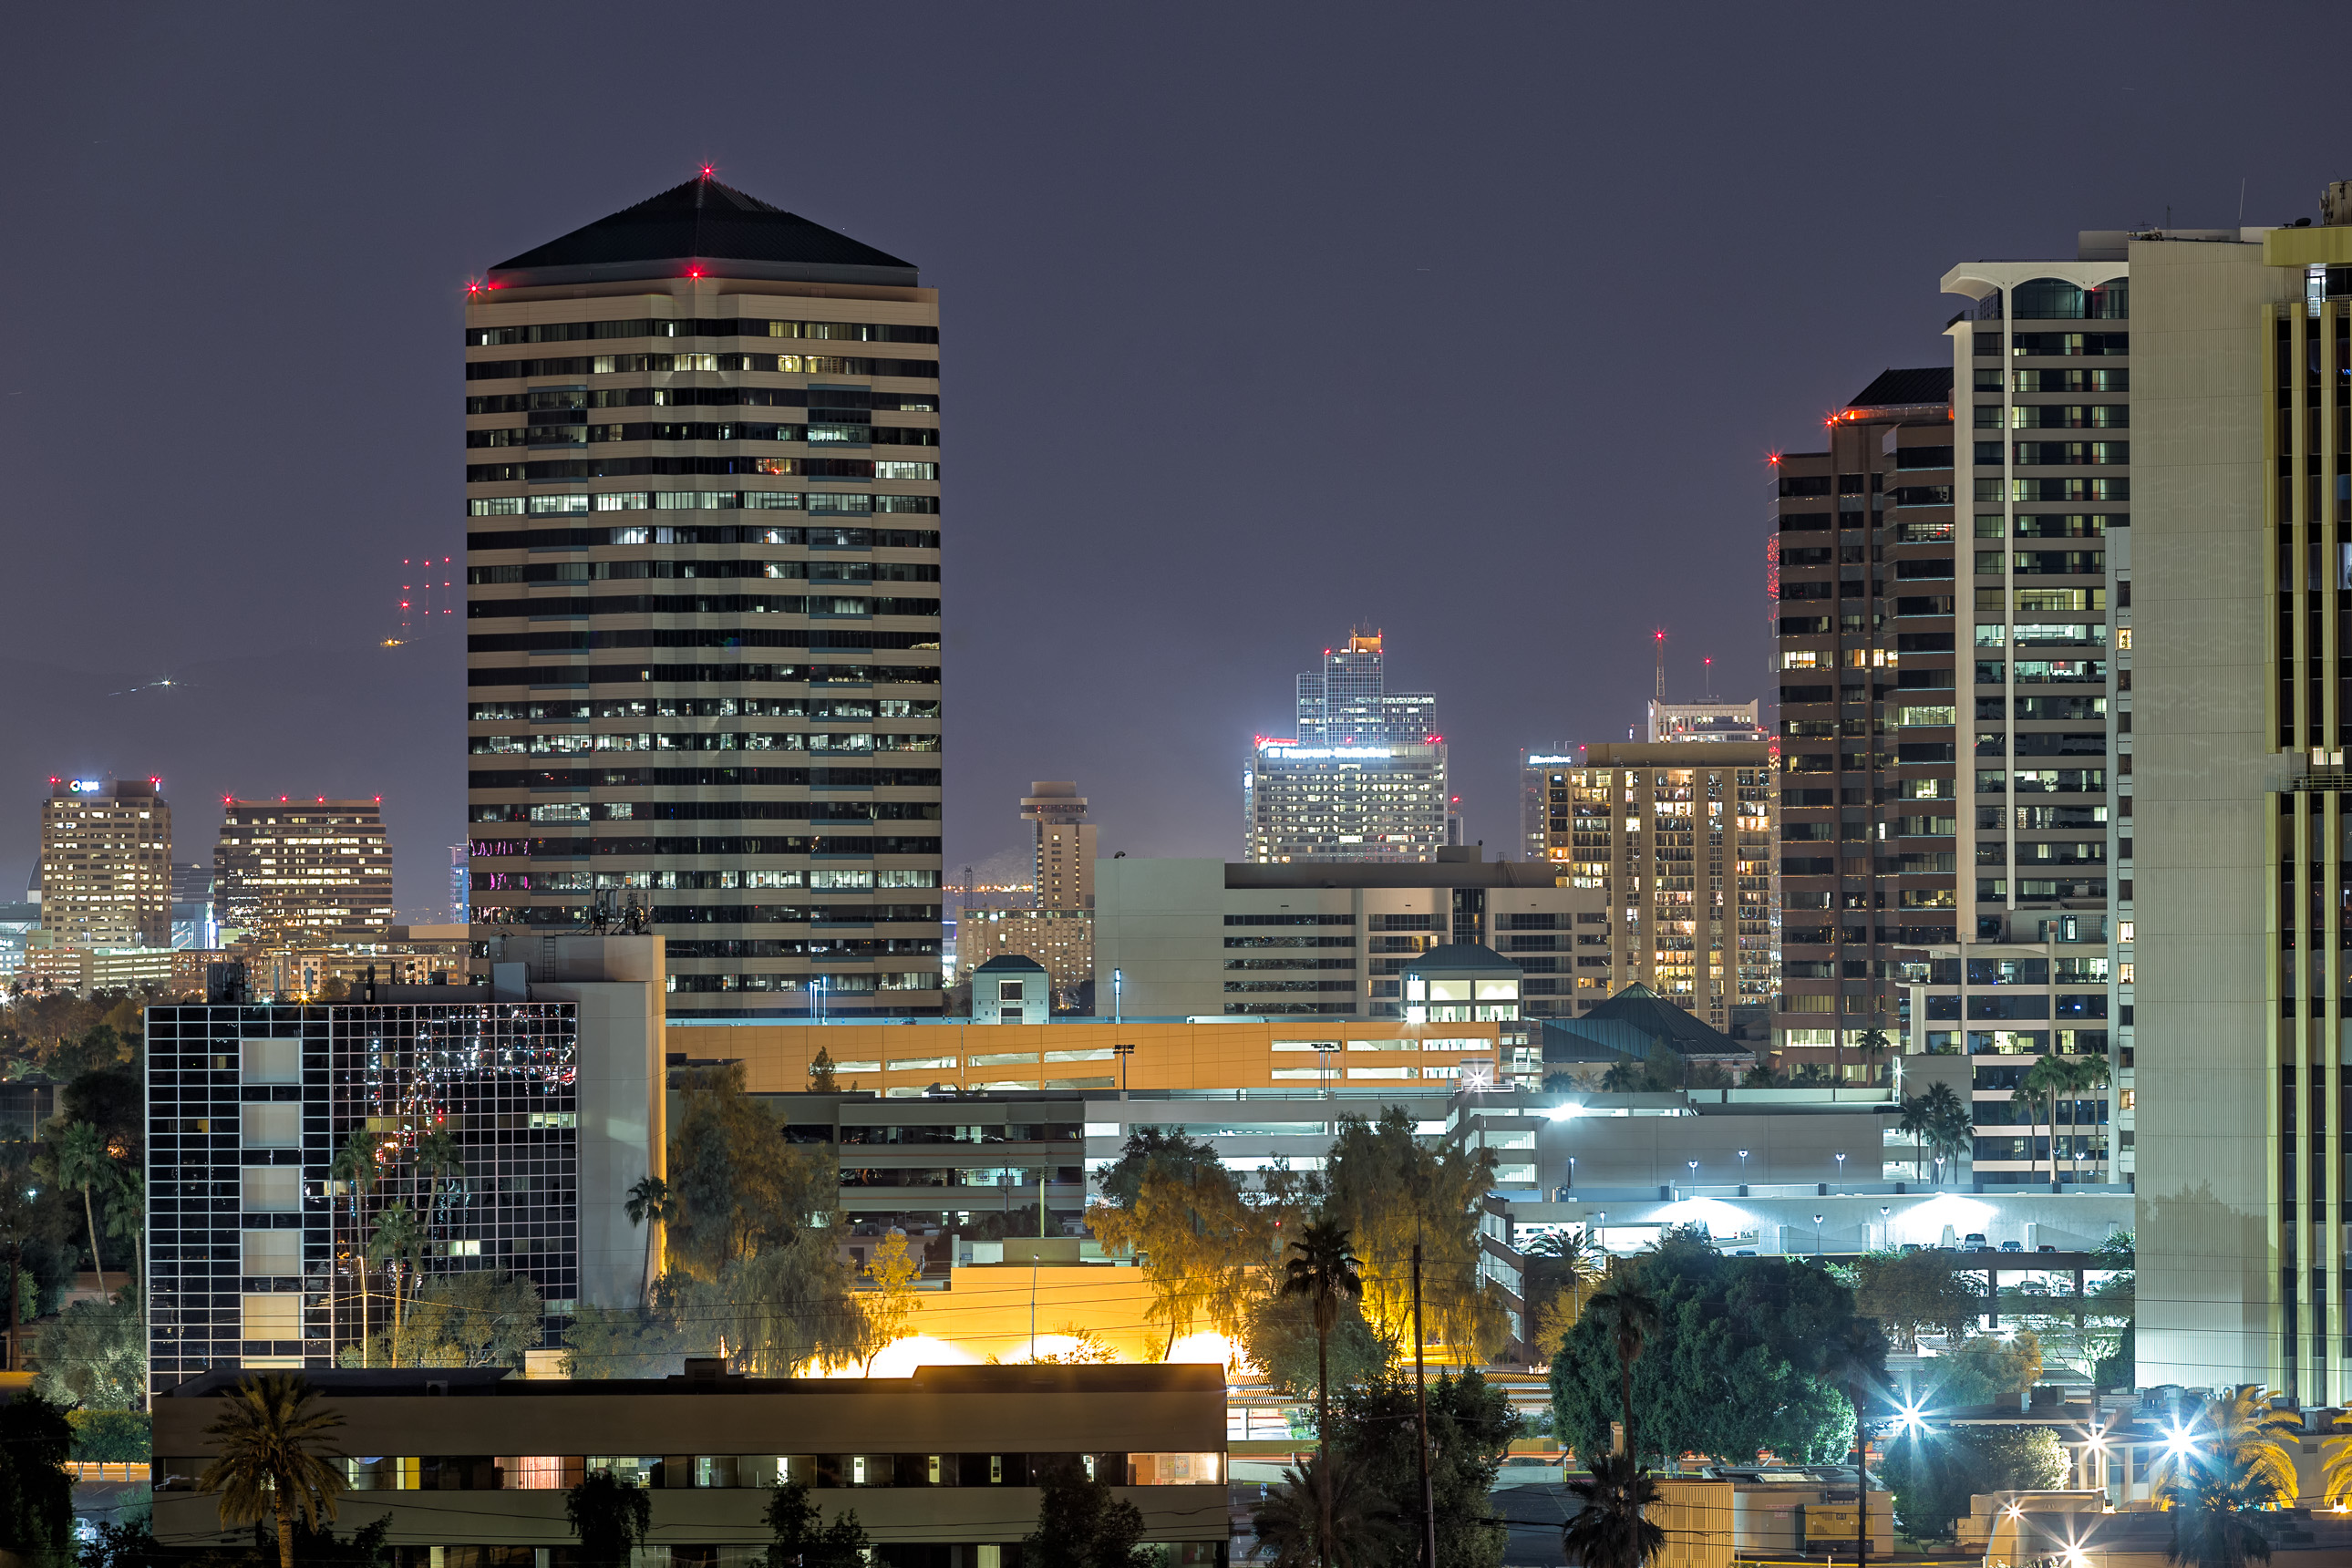 Midtown Phoenix and Phoenix Plaza at night